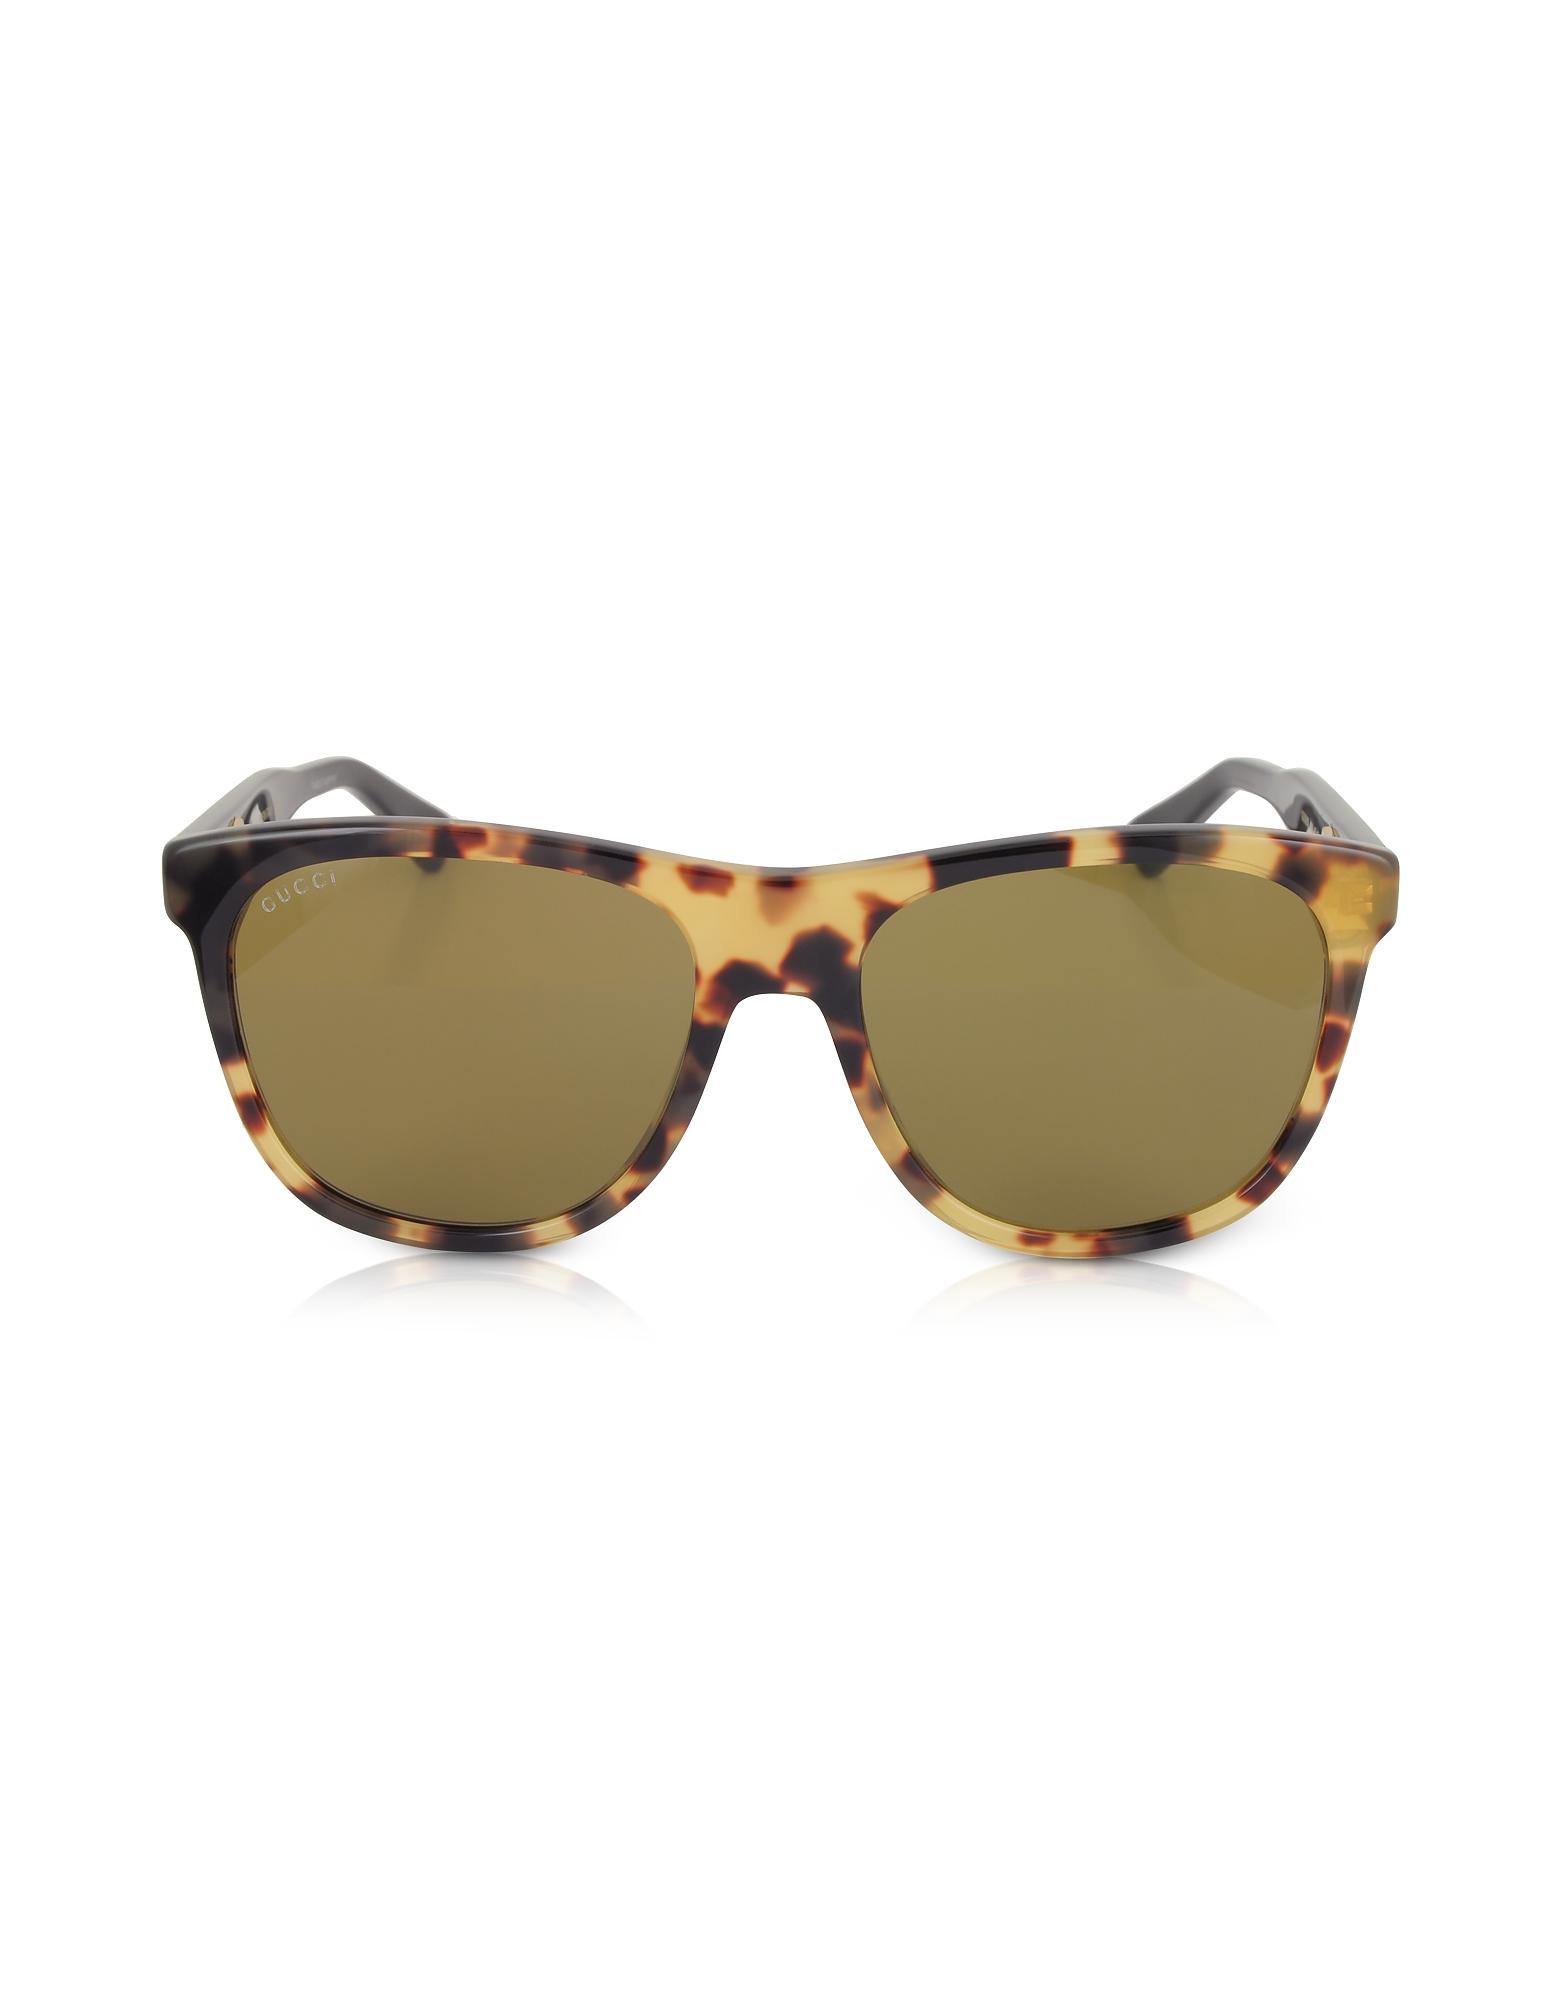 Gucci Designer Sunglasses, GG0266S Squared-frame Havana Brown Sunglasses w/Polarized Lenses